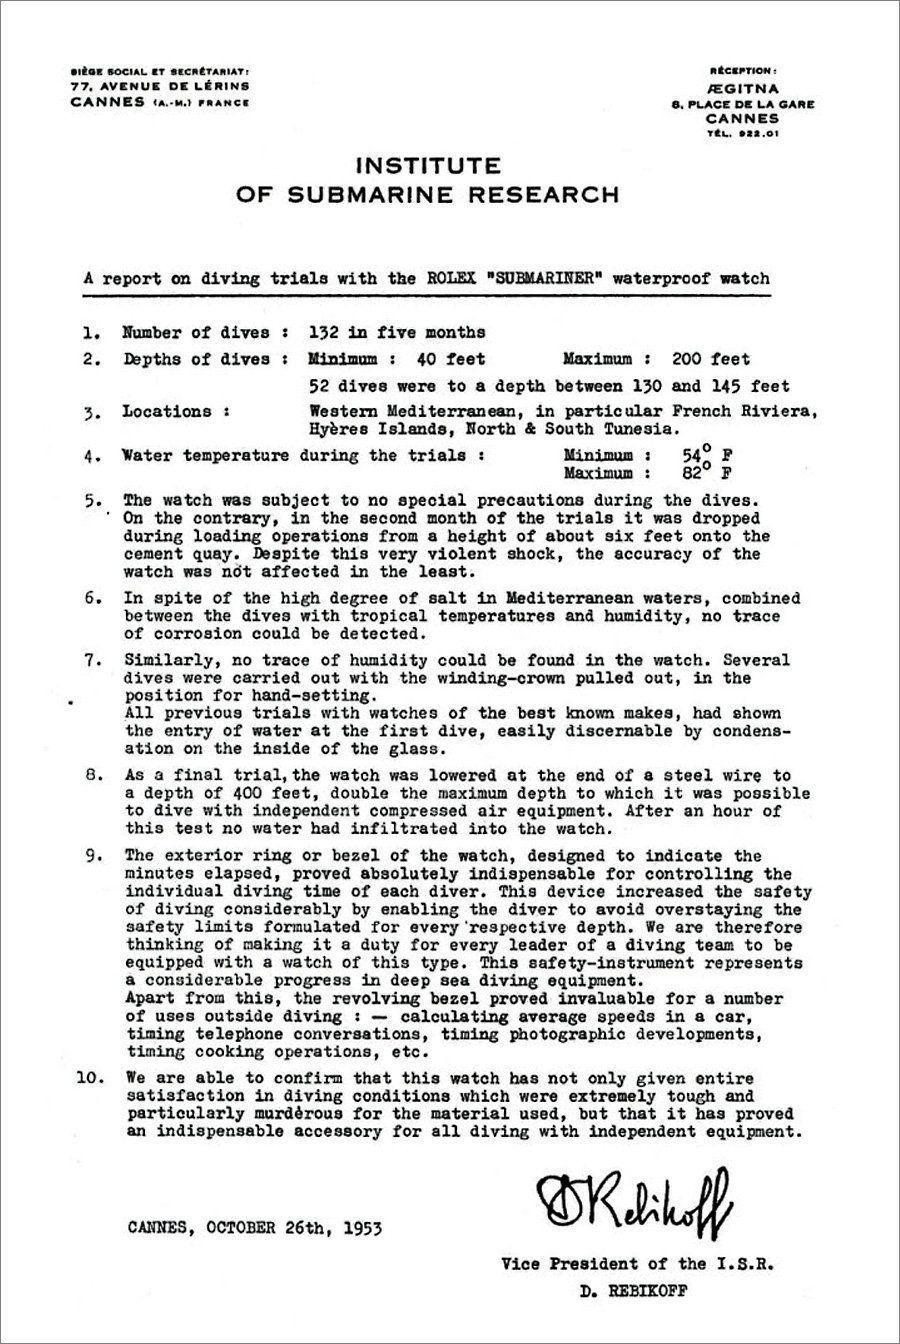 ariner-Institute-Of-Submarine-Research-1953-Letter.jpg